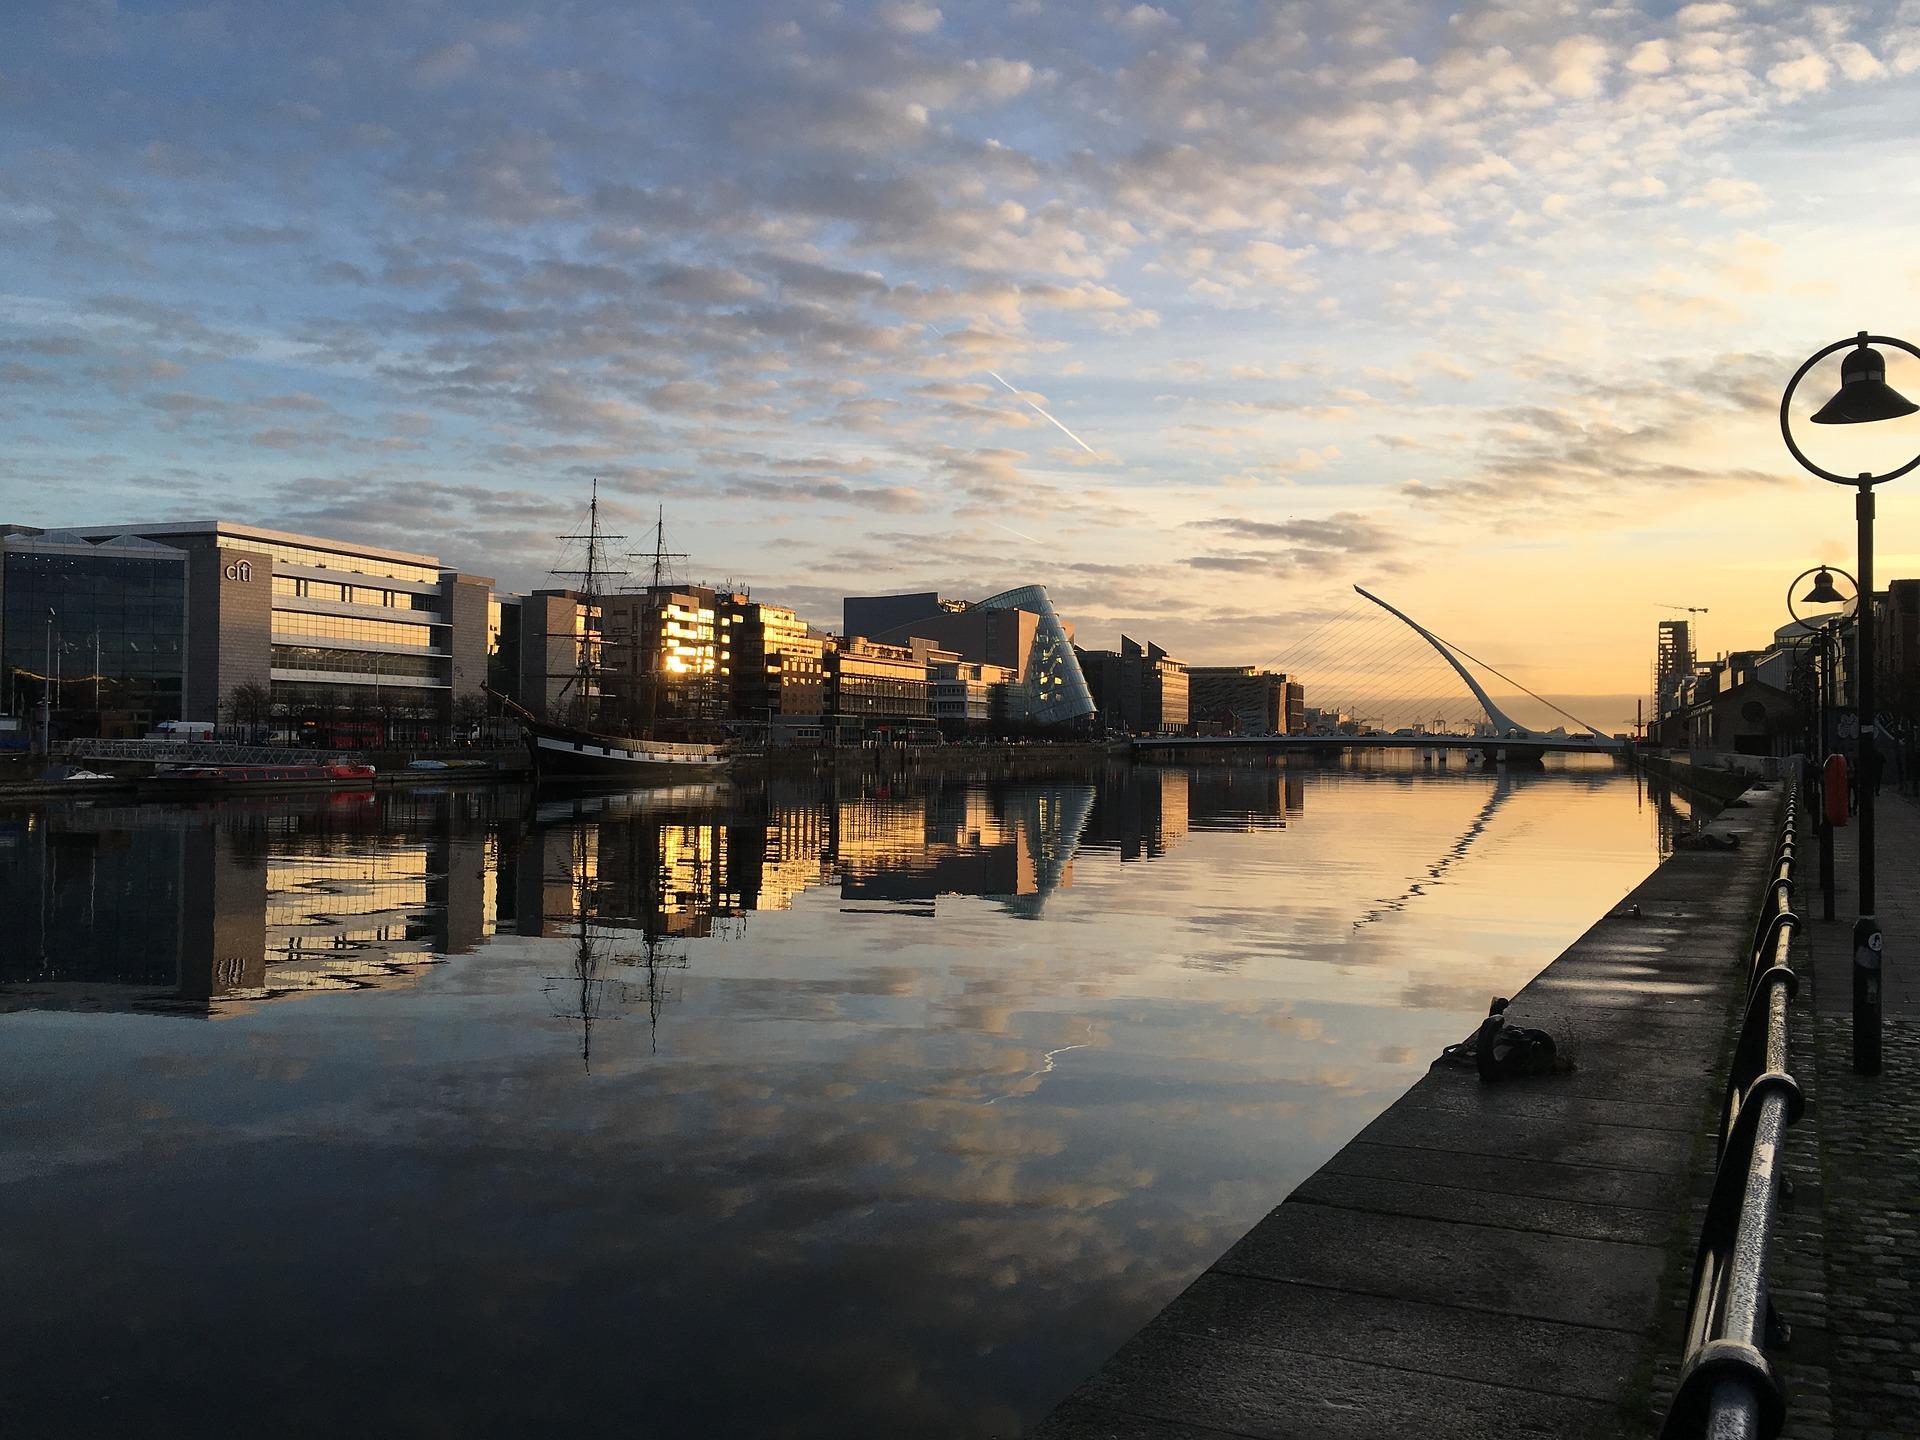 Dublin Housing Boom Set To Bust? dublin 2972740 1920